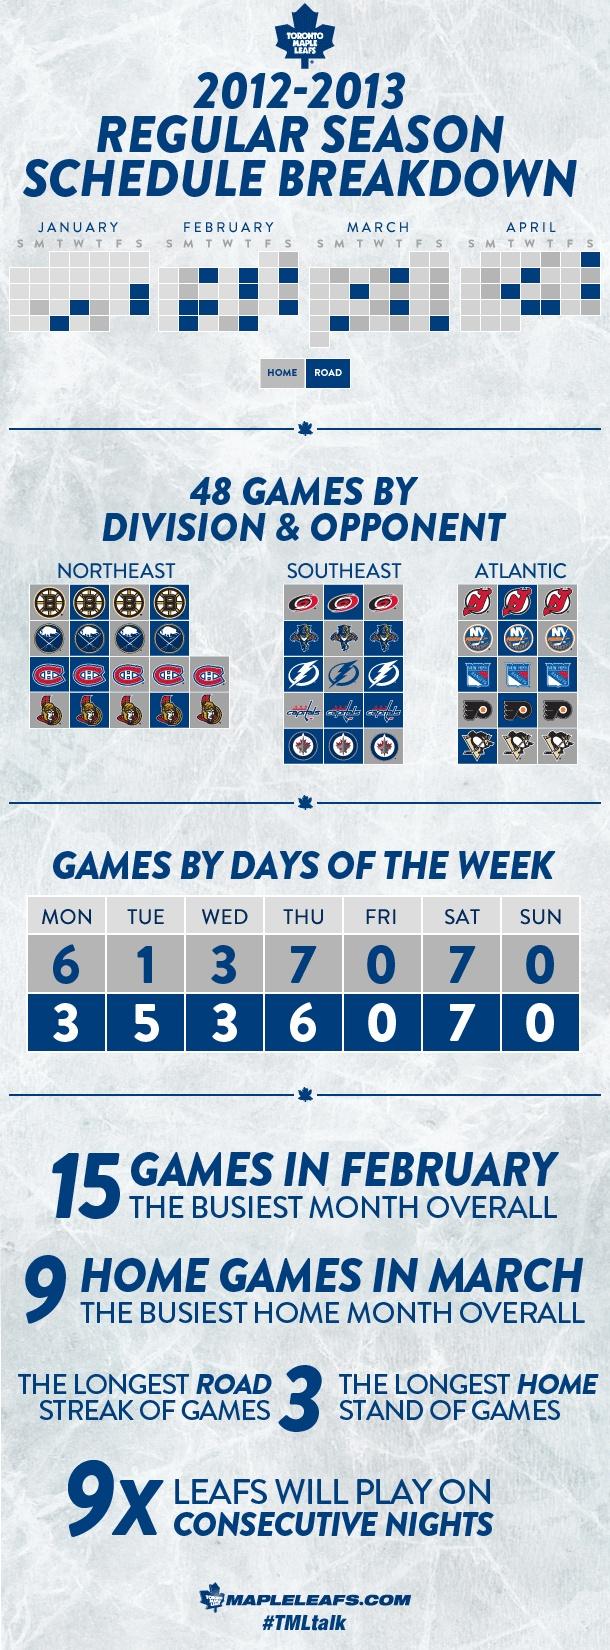 Infographic: 2012-2013 Regular Season Schedule Breakdown - Toronto Maple Leafs - Features